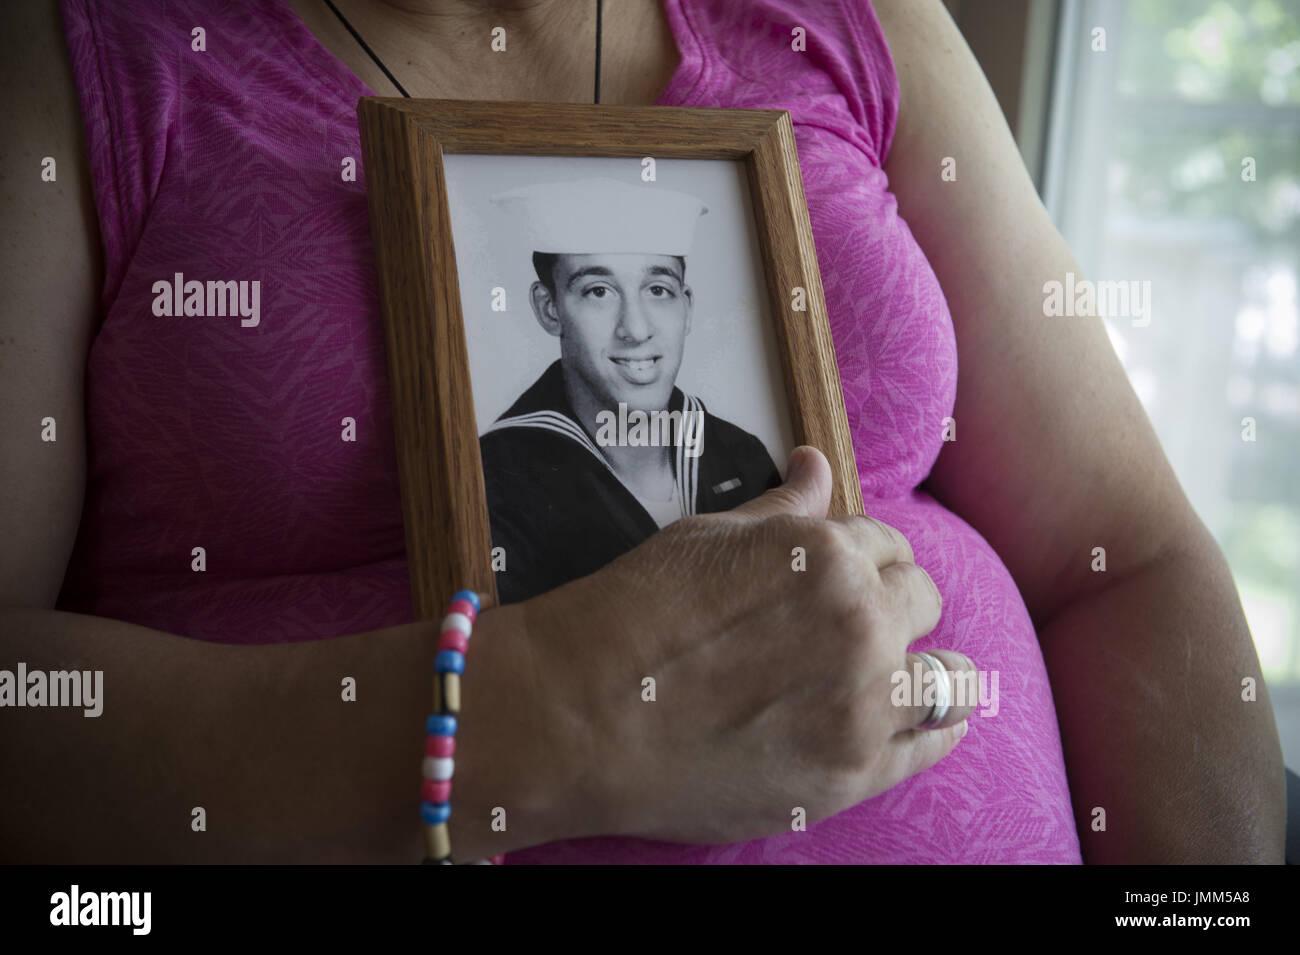 Großzügig Draht Rosa Flagge Album Fotos - Elektrische Schaltplan ...